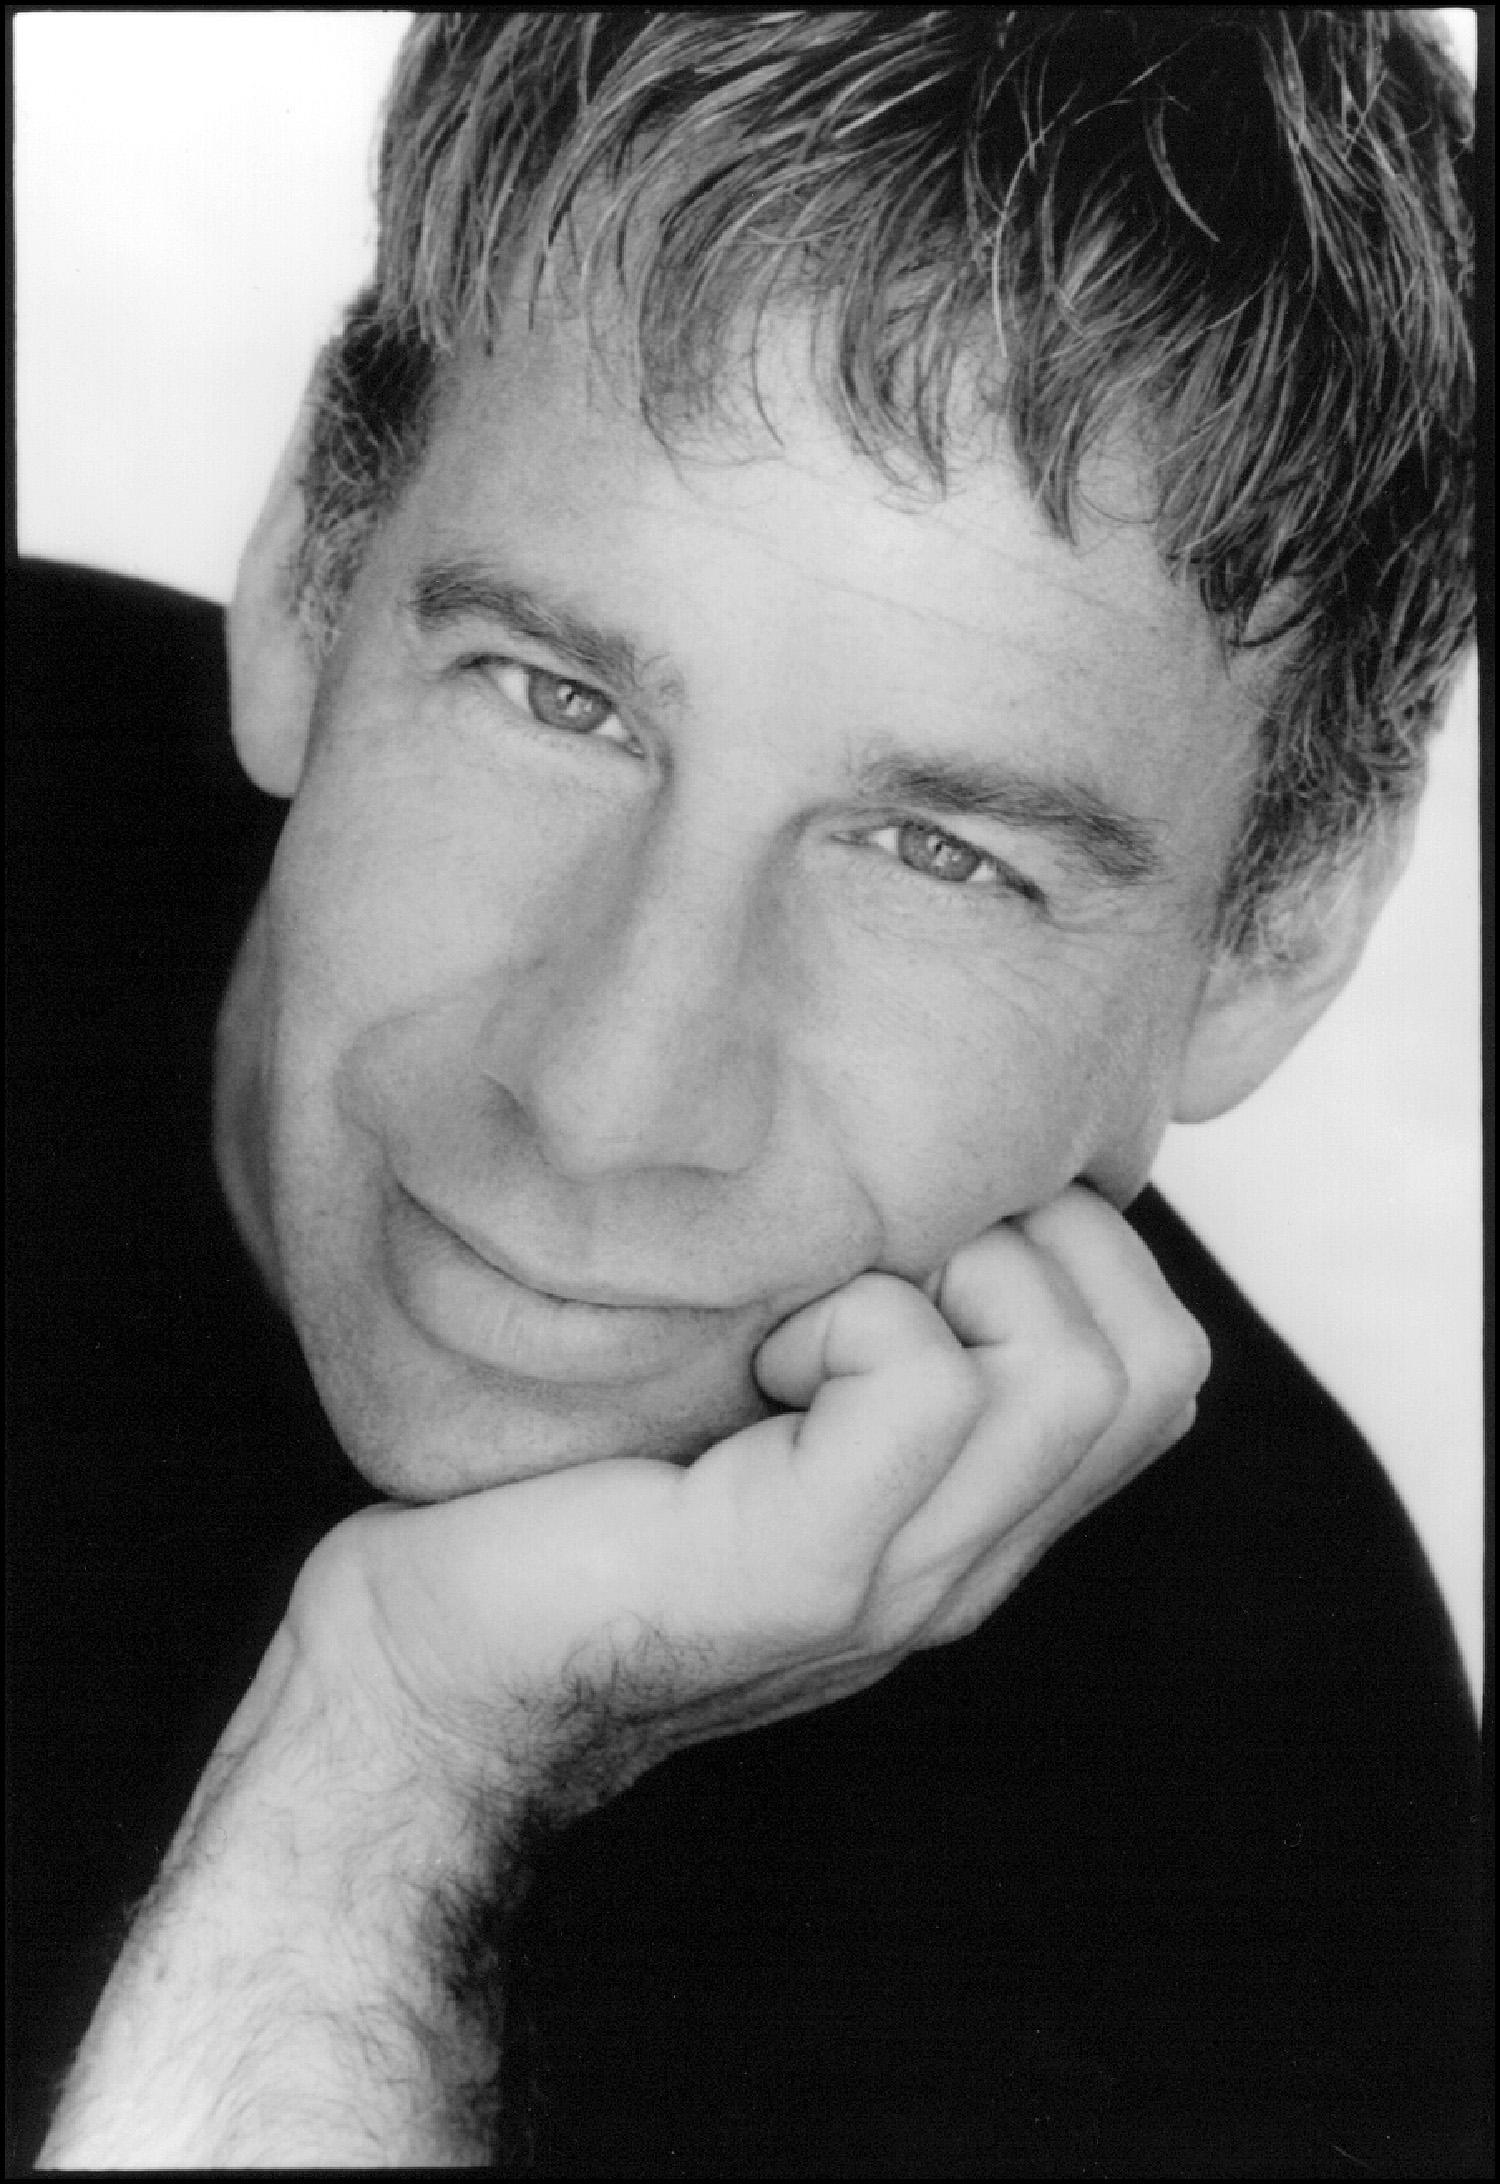 Stephen Schwartz - Wicked (Original Broadway Cast Recording)